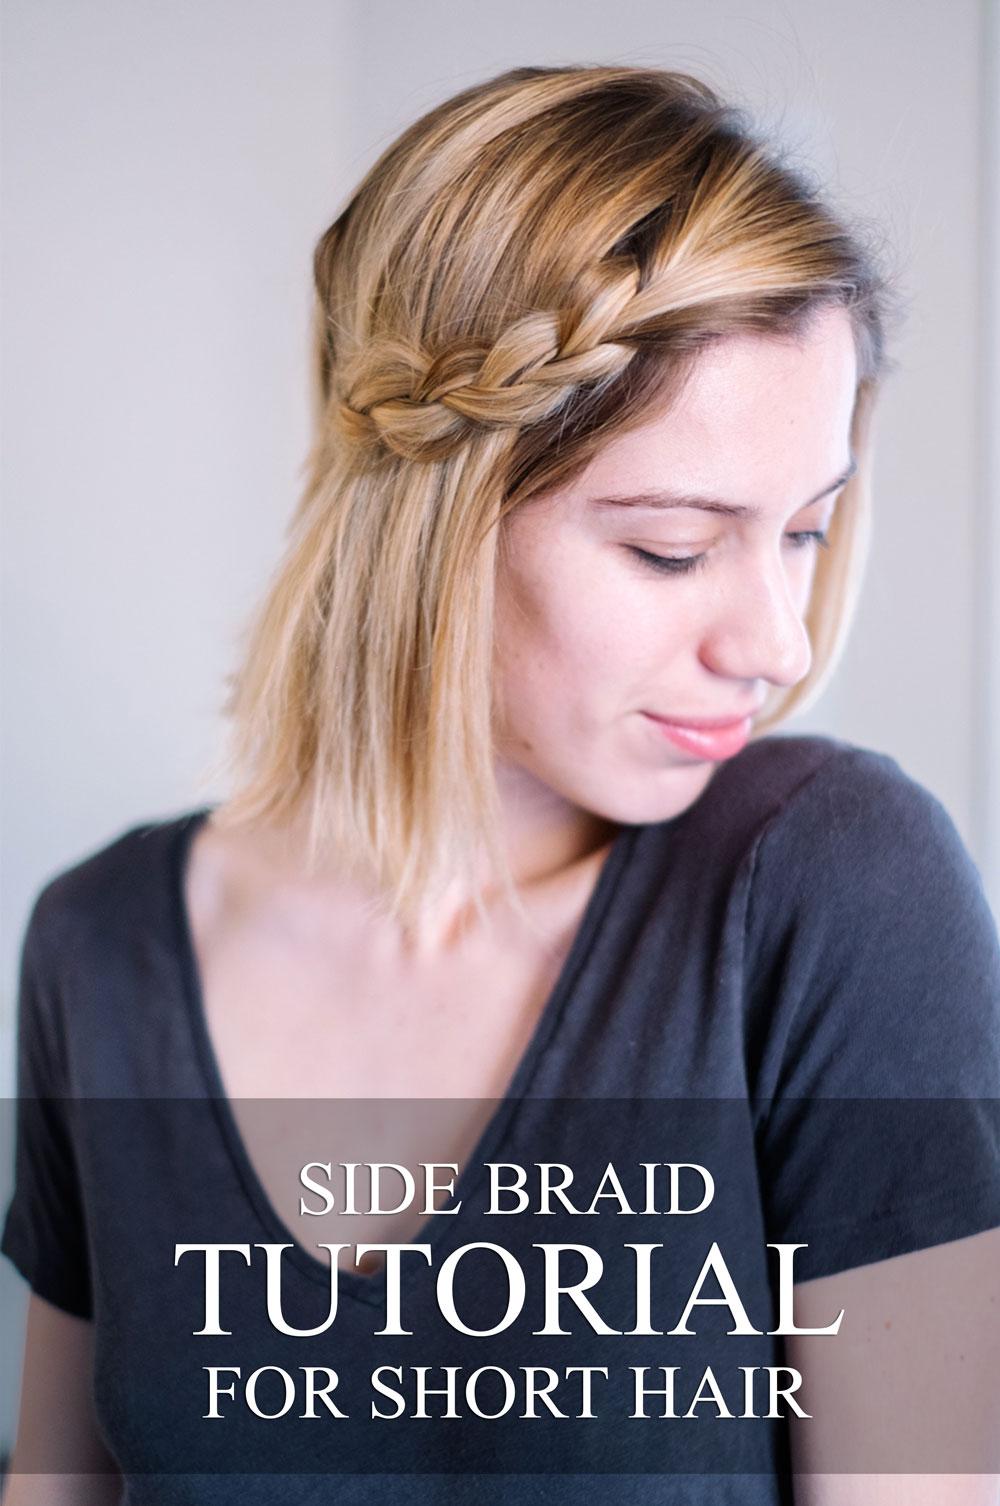 Side Braid Tutorial For Short Hair It S Julien